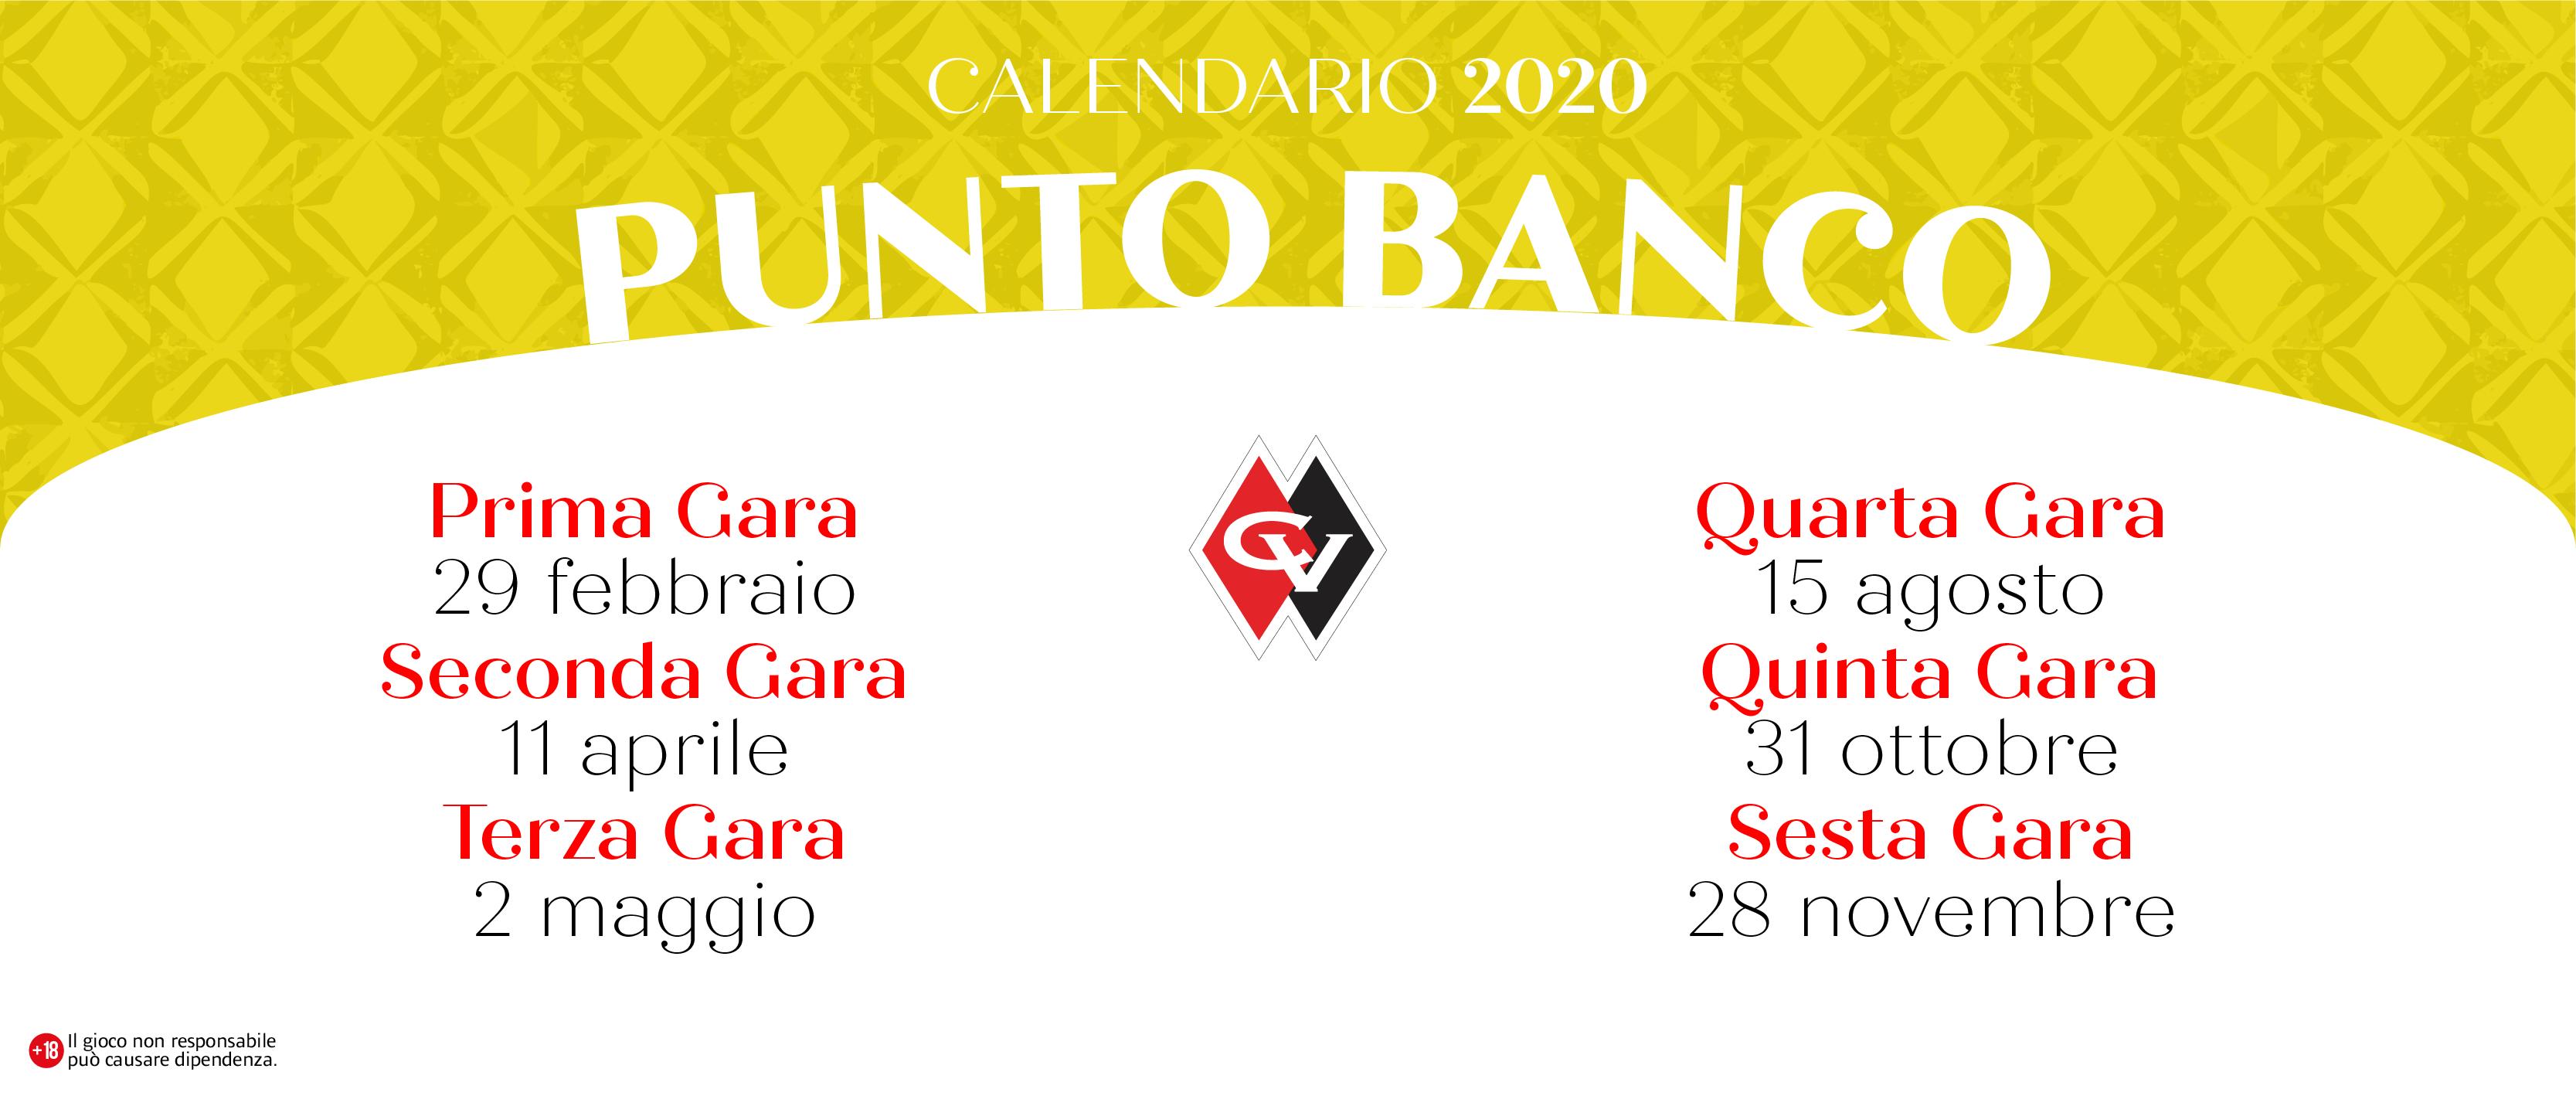 Punto Banco 2020